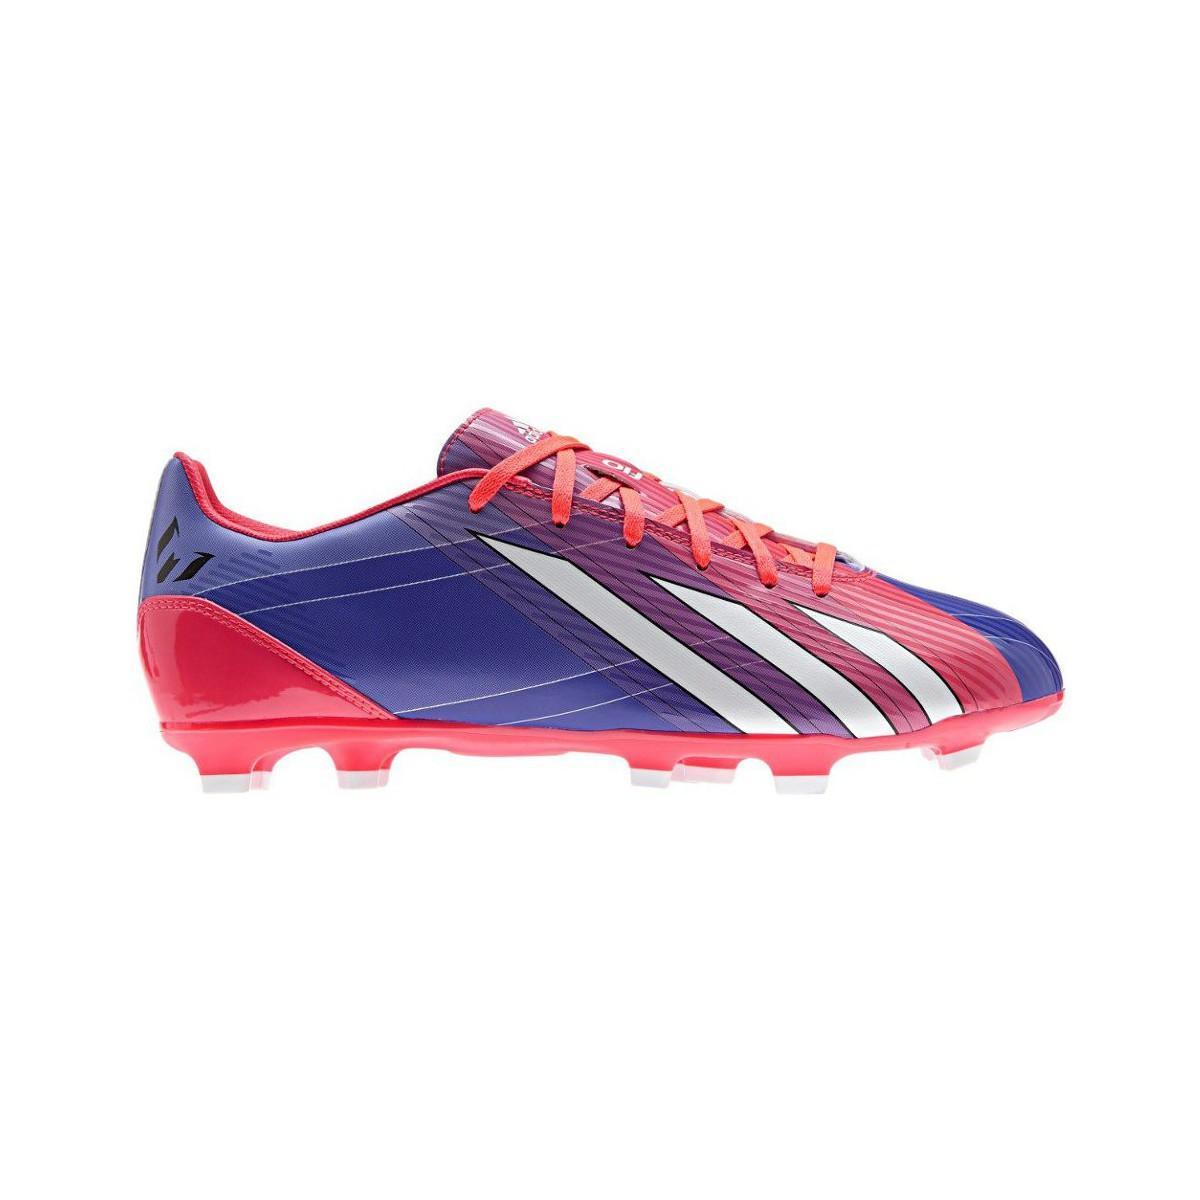 wholesale dealer 840e6 8d1b5 adidas F10 Trx Fg Men s Football Boots In Multicolour in Red for Men ...